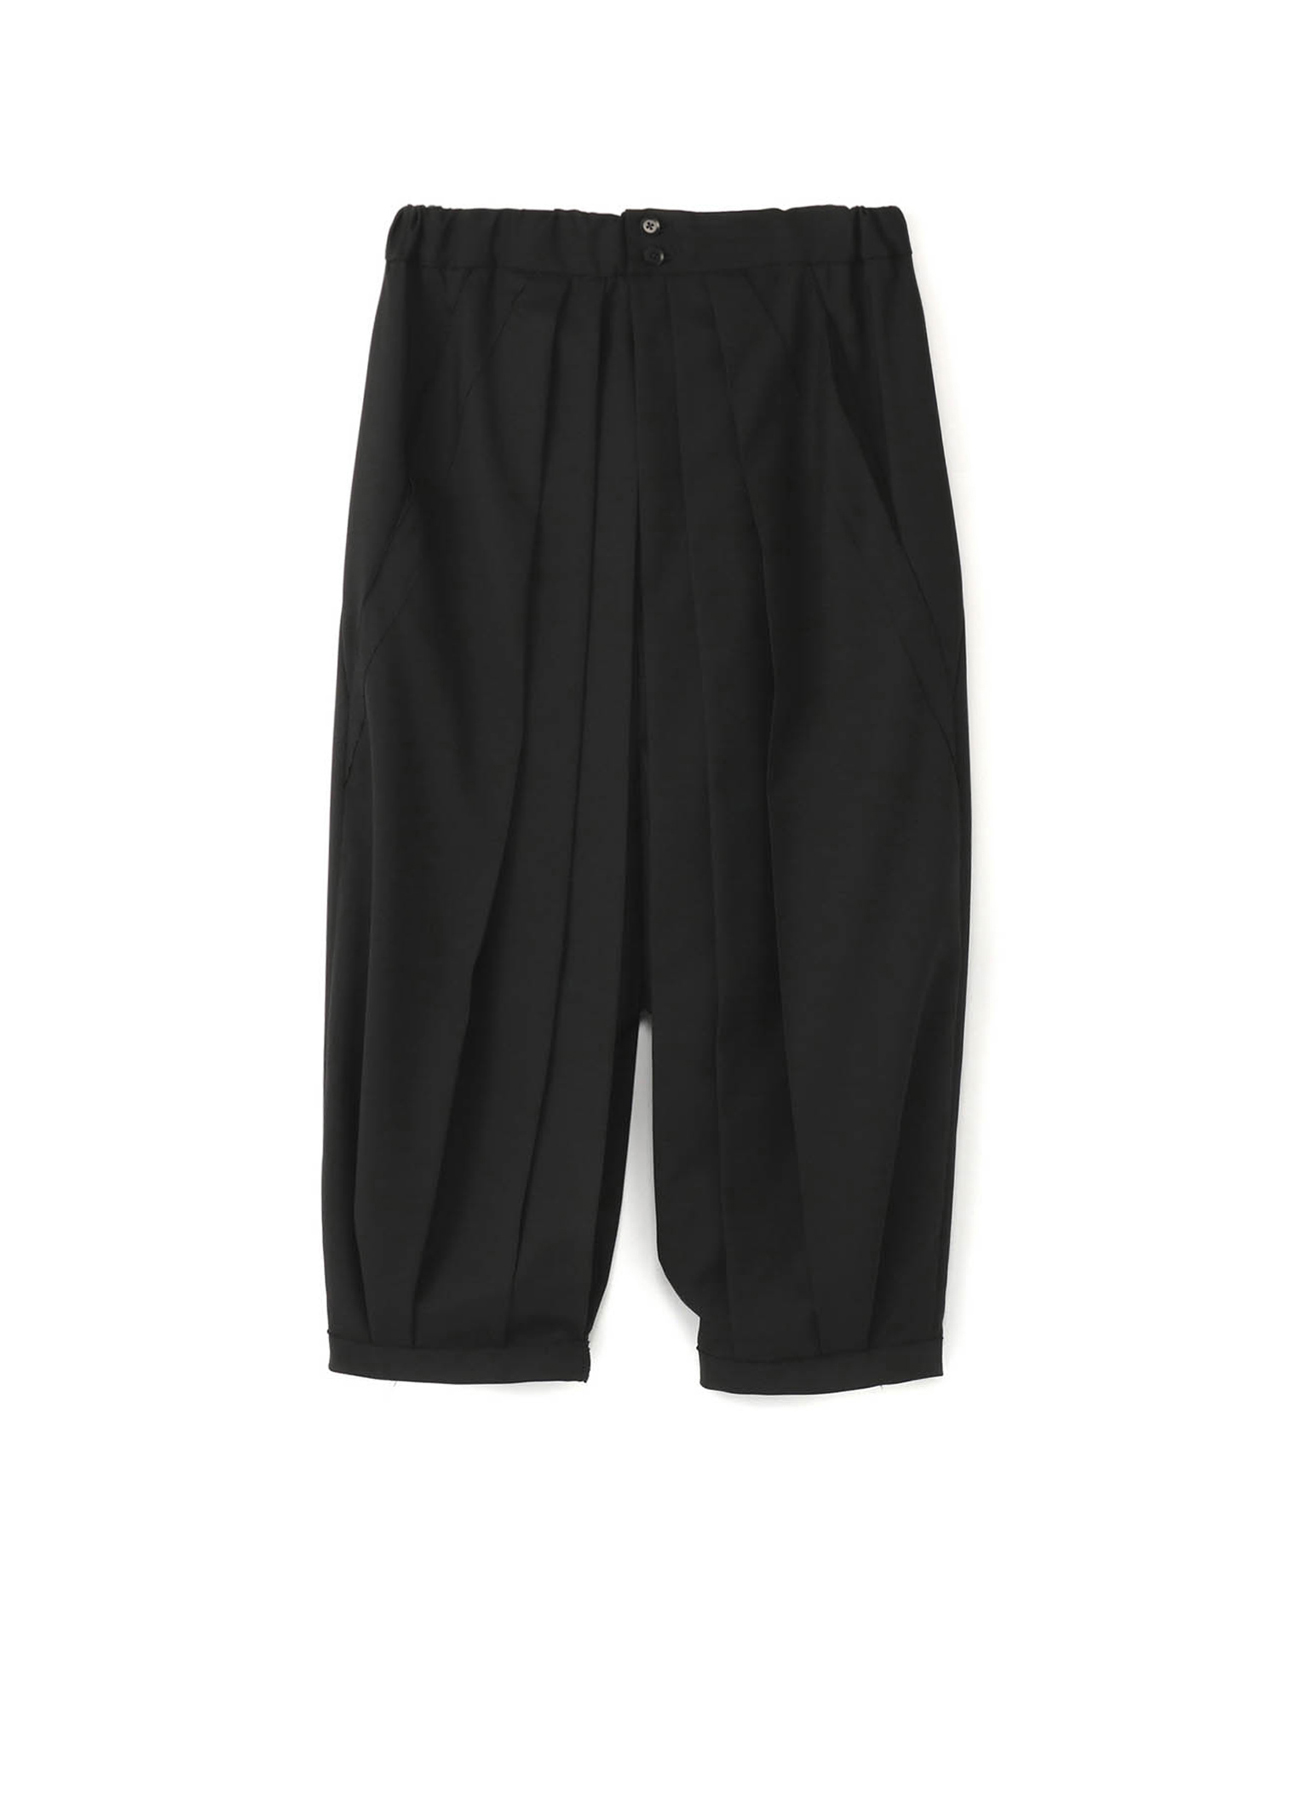 Classic W/E Gabardine GY Hakama Pants Type 2